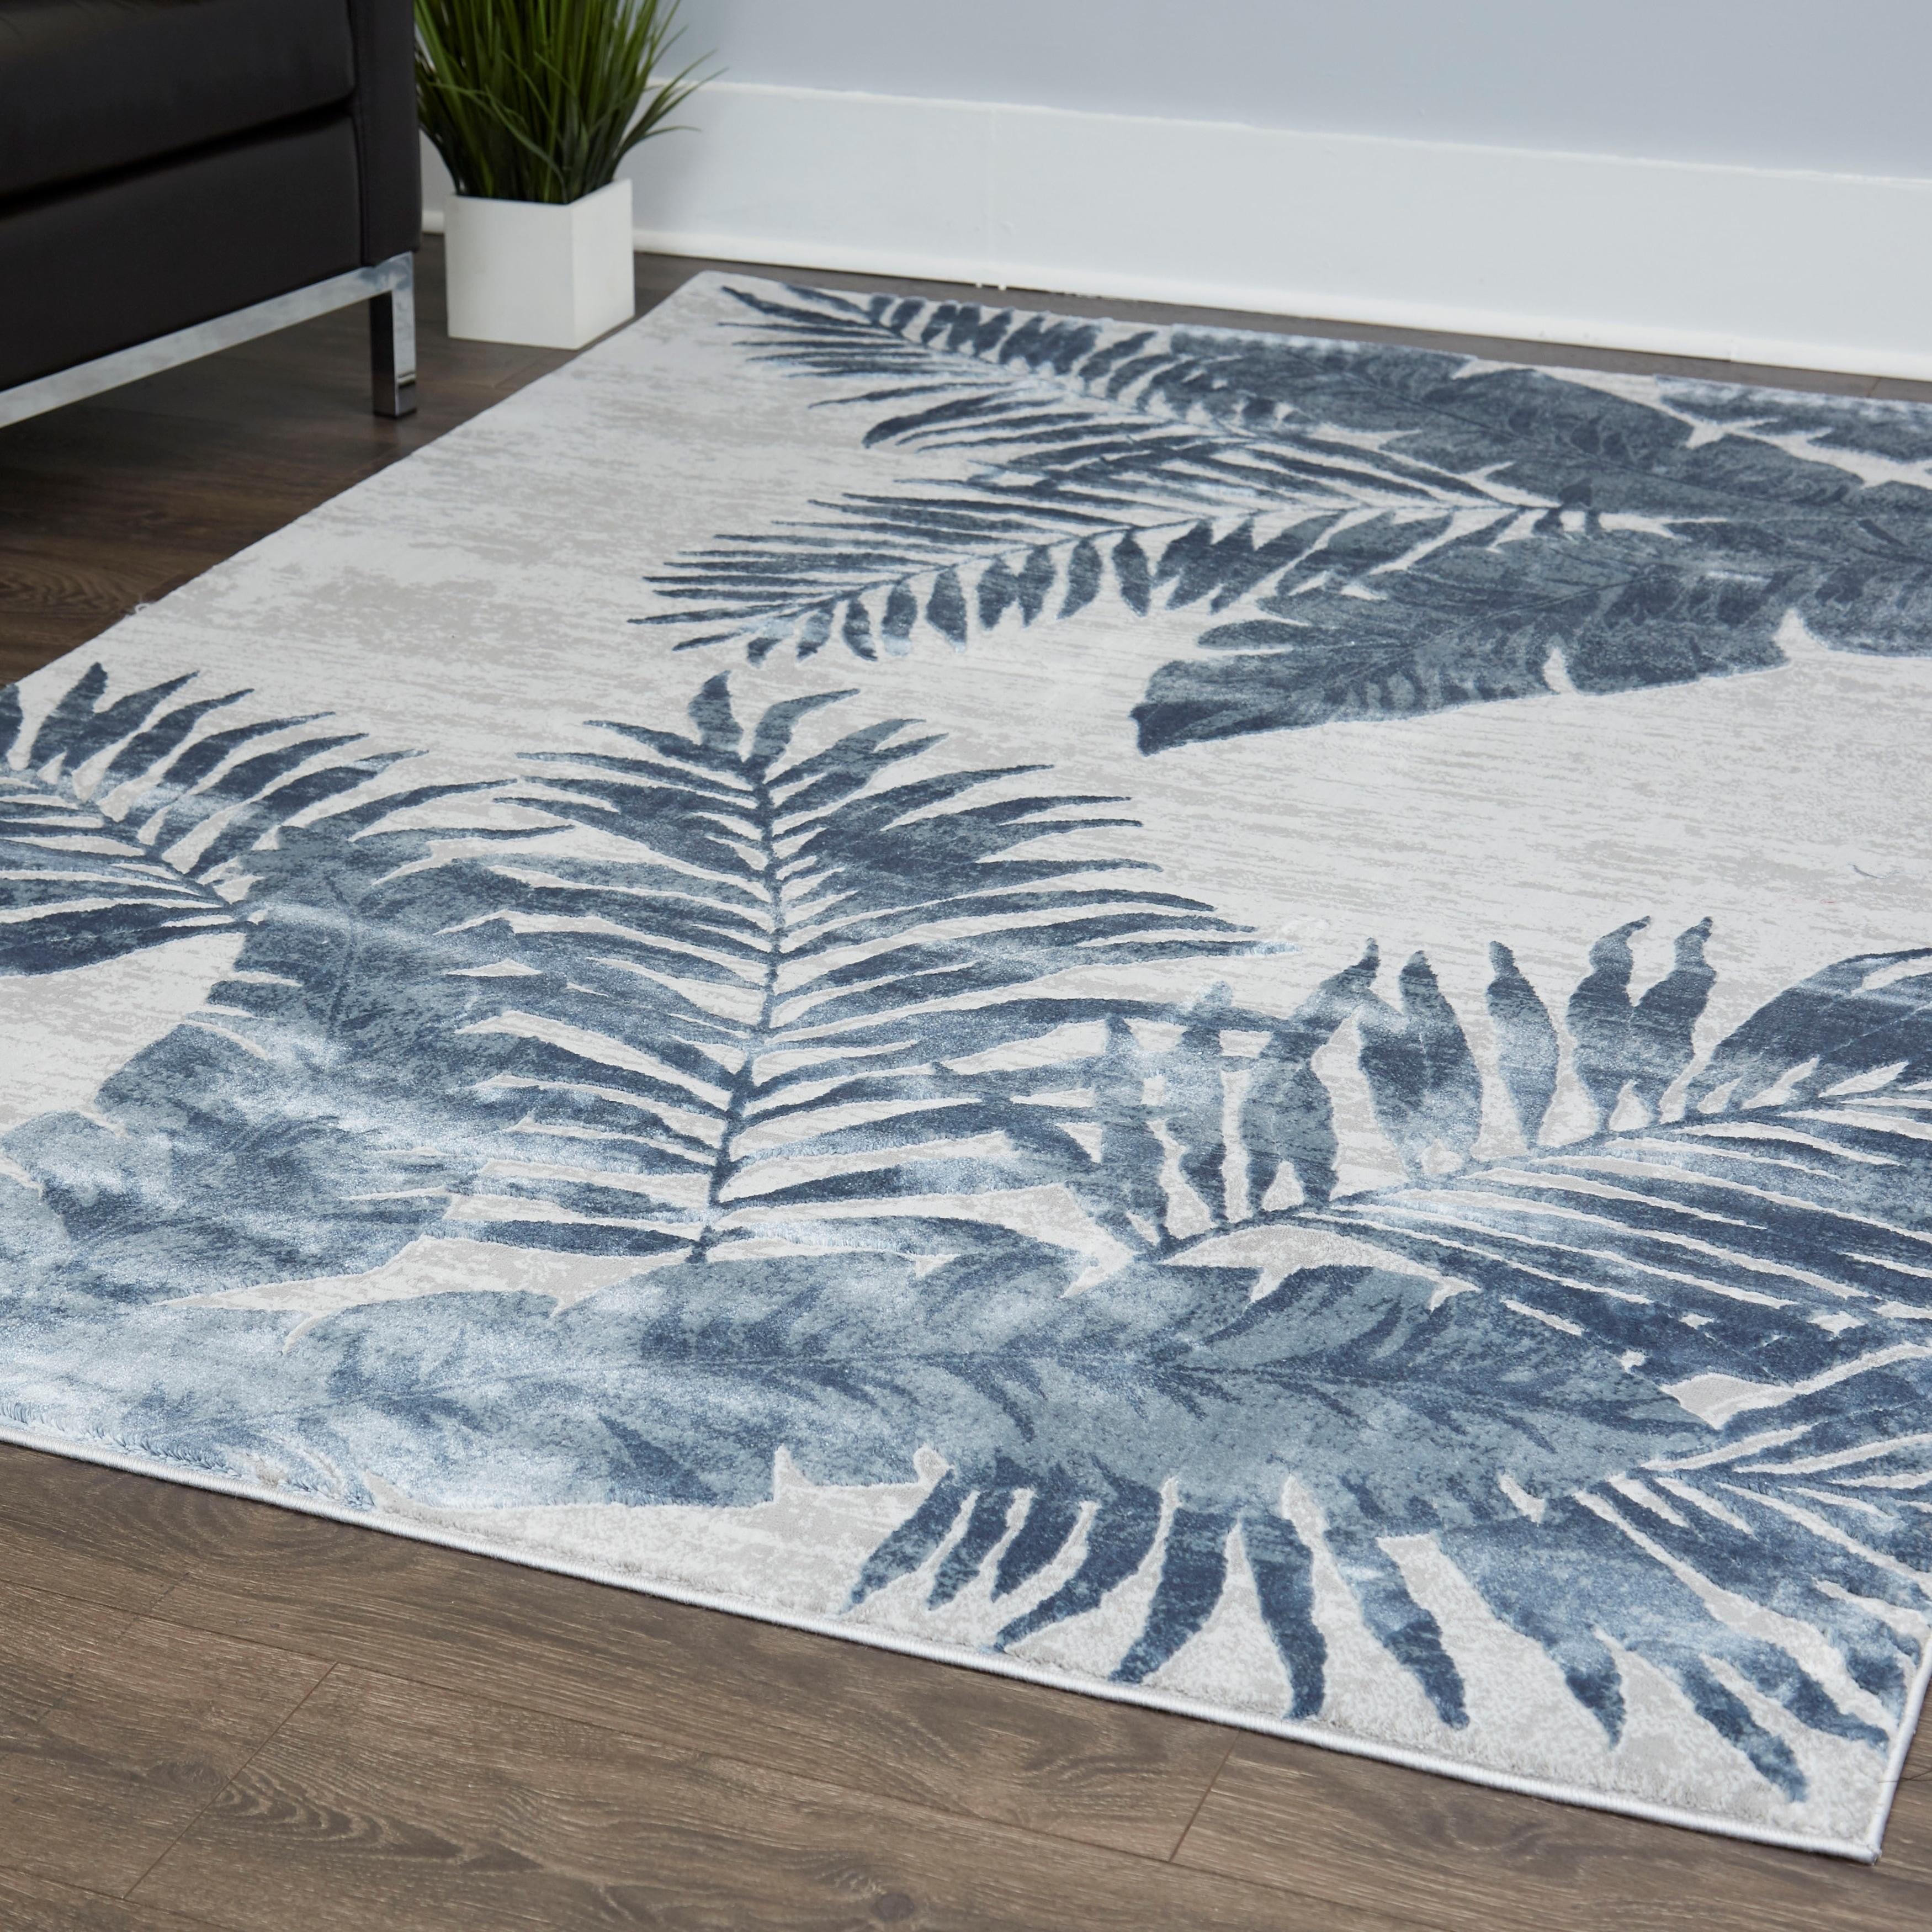 white nicole itm rug rugs aqua designer area geometric carpet miller synergy shag swirls